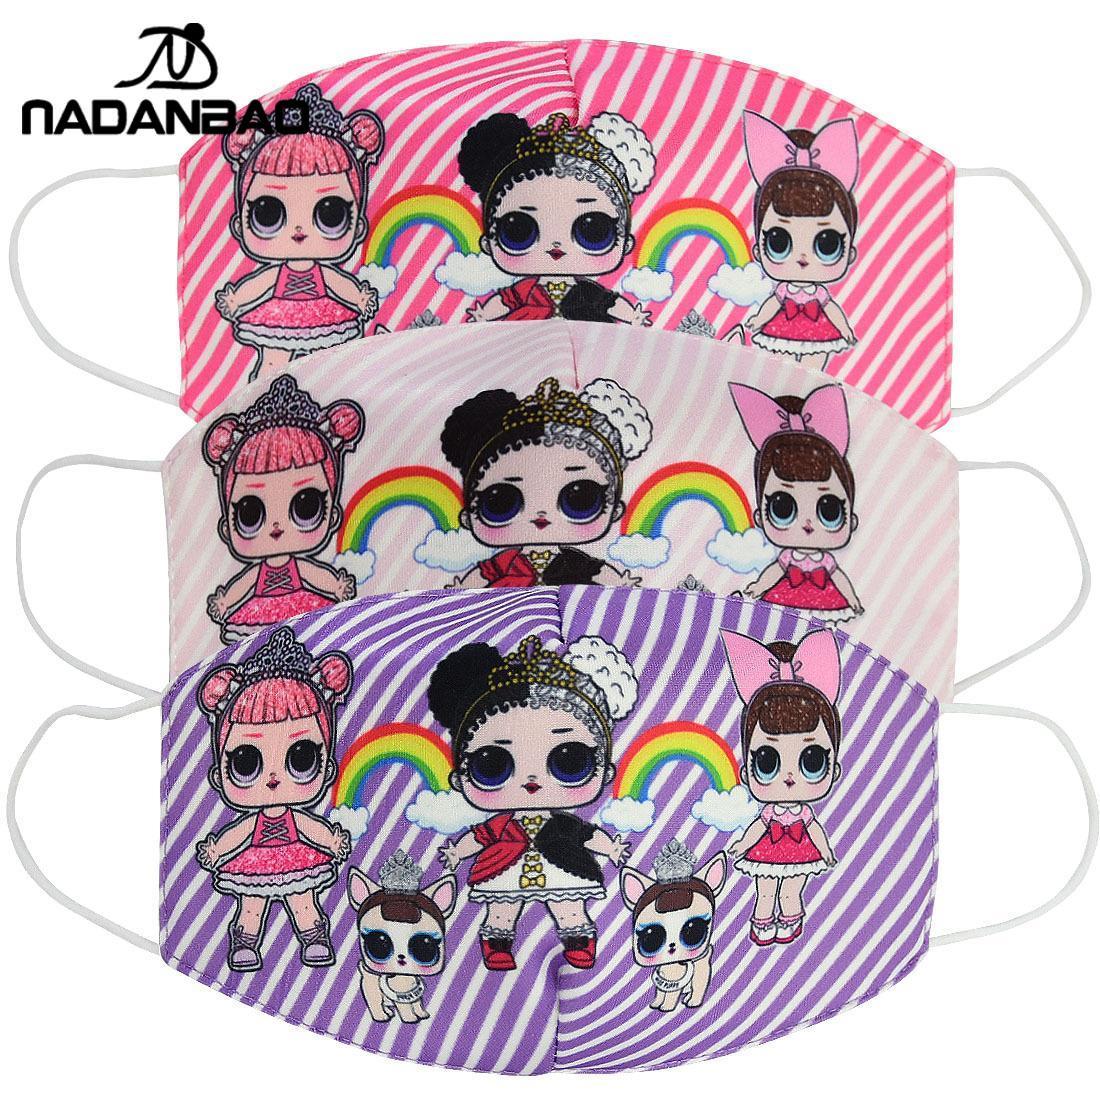 NADANBAO 2020 New Children's Print Face Mask Cotton Dust-proof Anti-fog Kid's Mask Pink Stripe LOL Doll Print Masks For Women